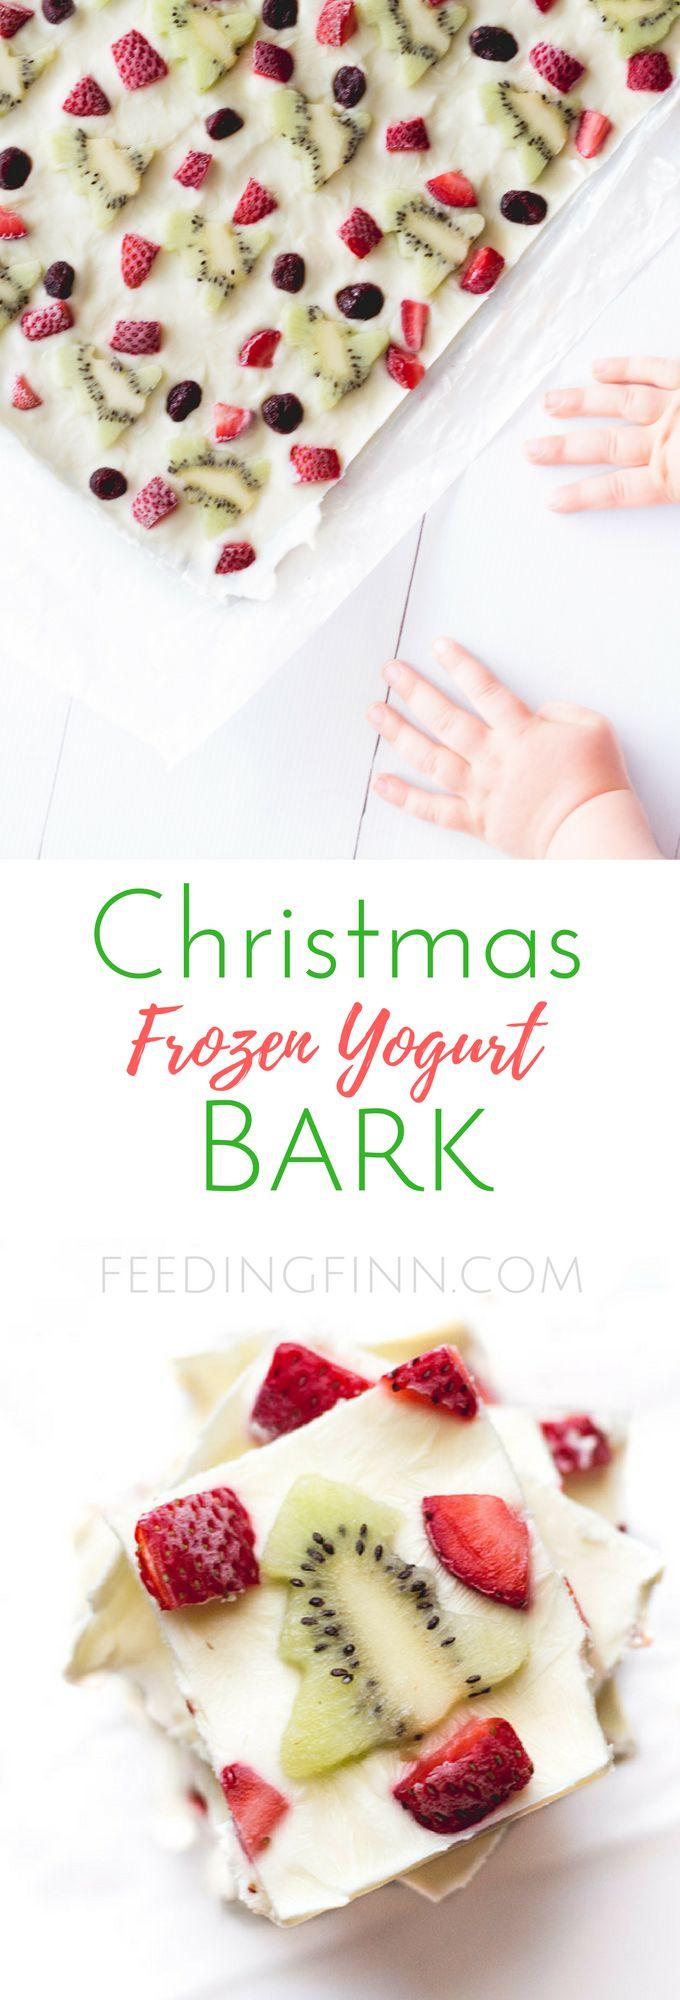 Christmas frozen yogurt bark. A healthy Christmas treat for kids.